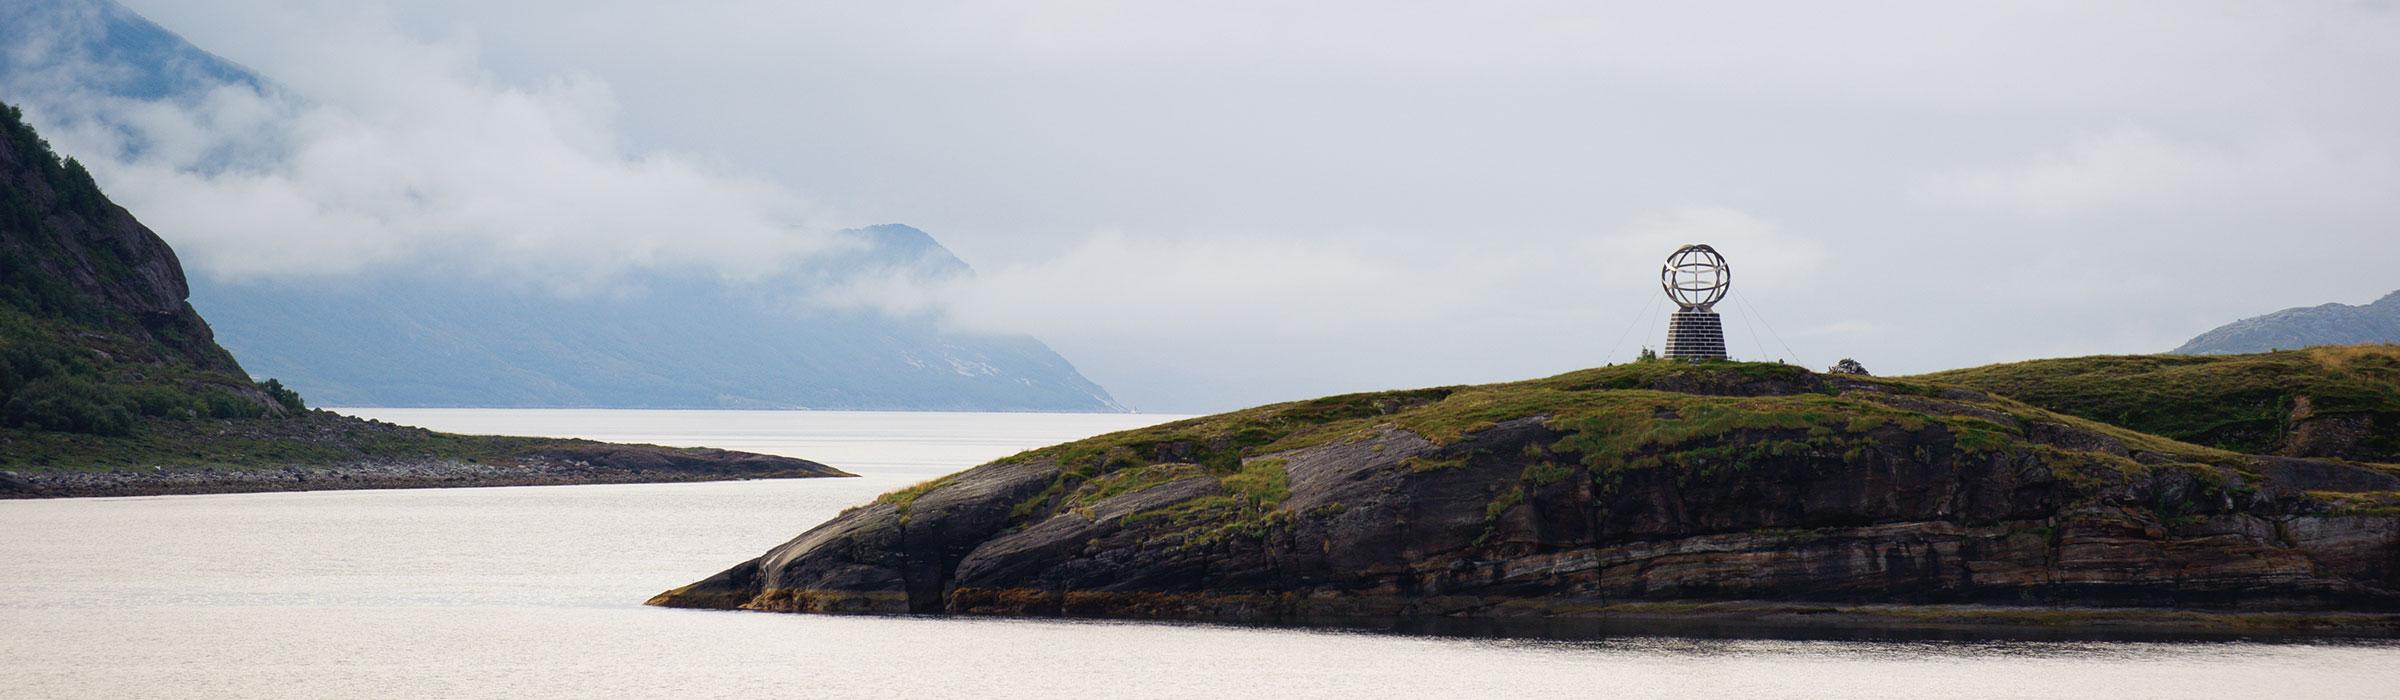 Nordkapp - Sommerreise mit Hurtigruten